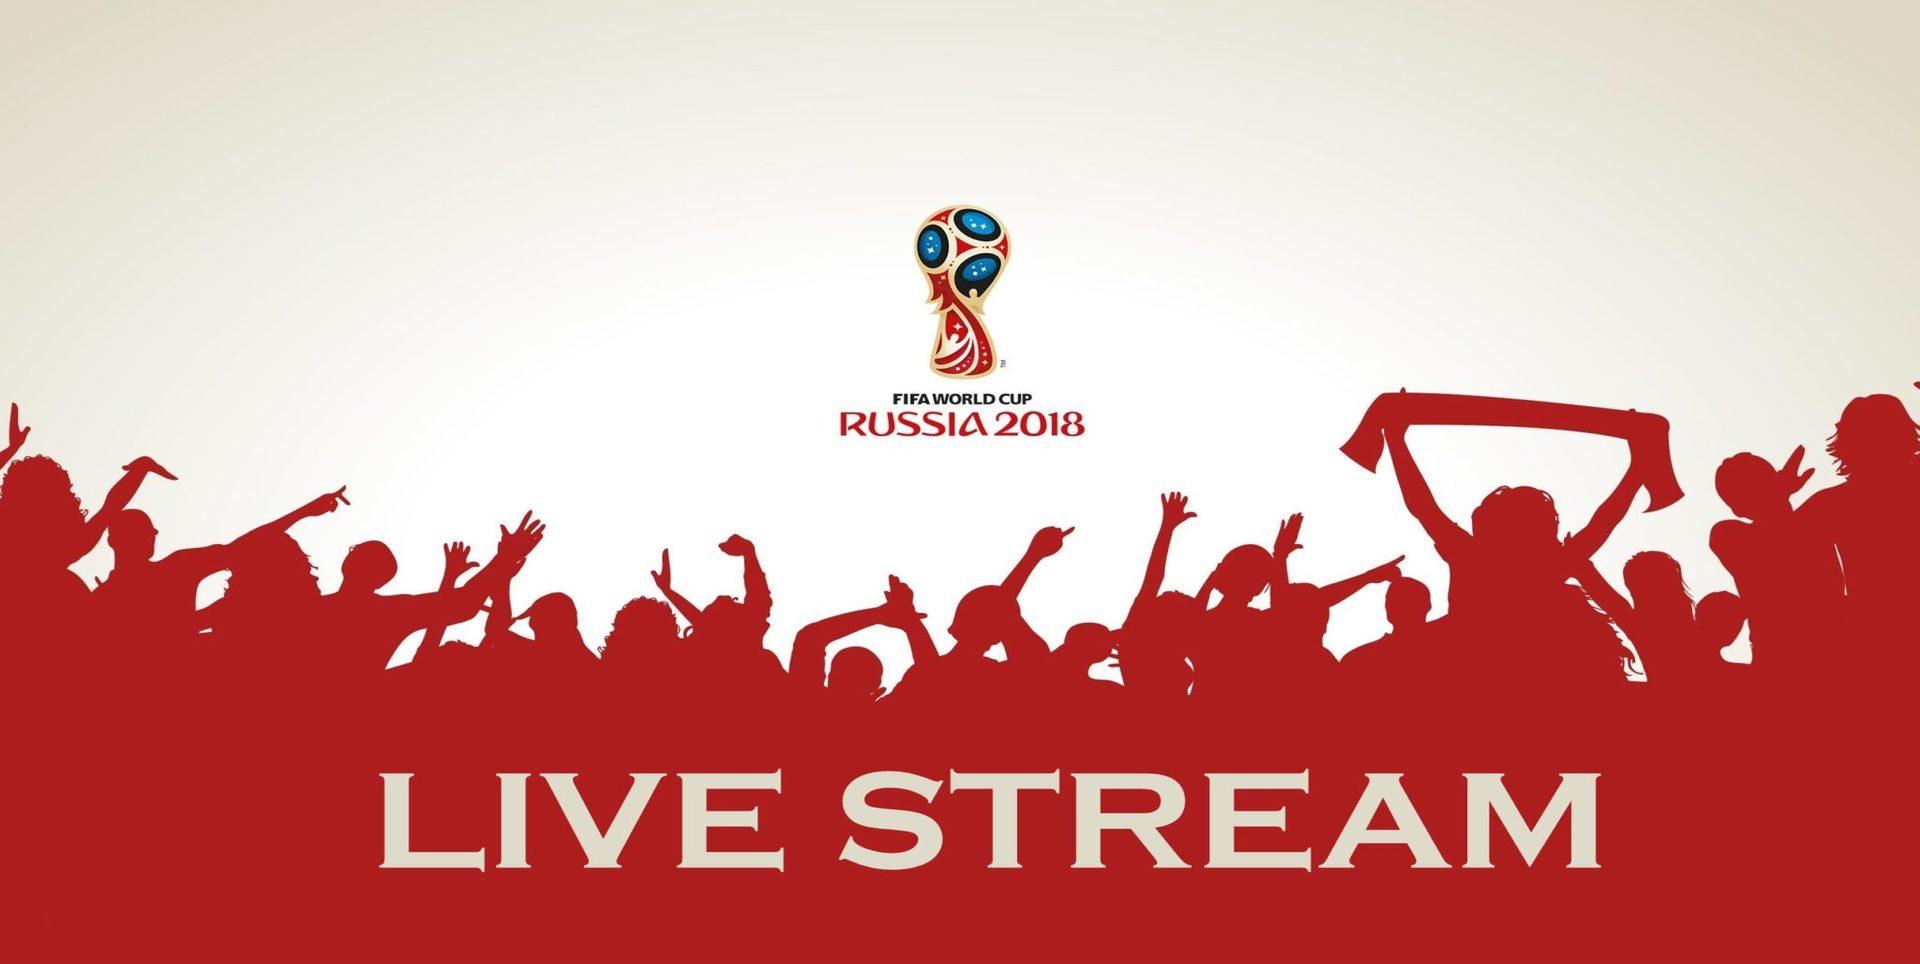 Rugby World Cup 2015 Online slider